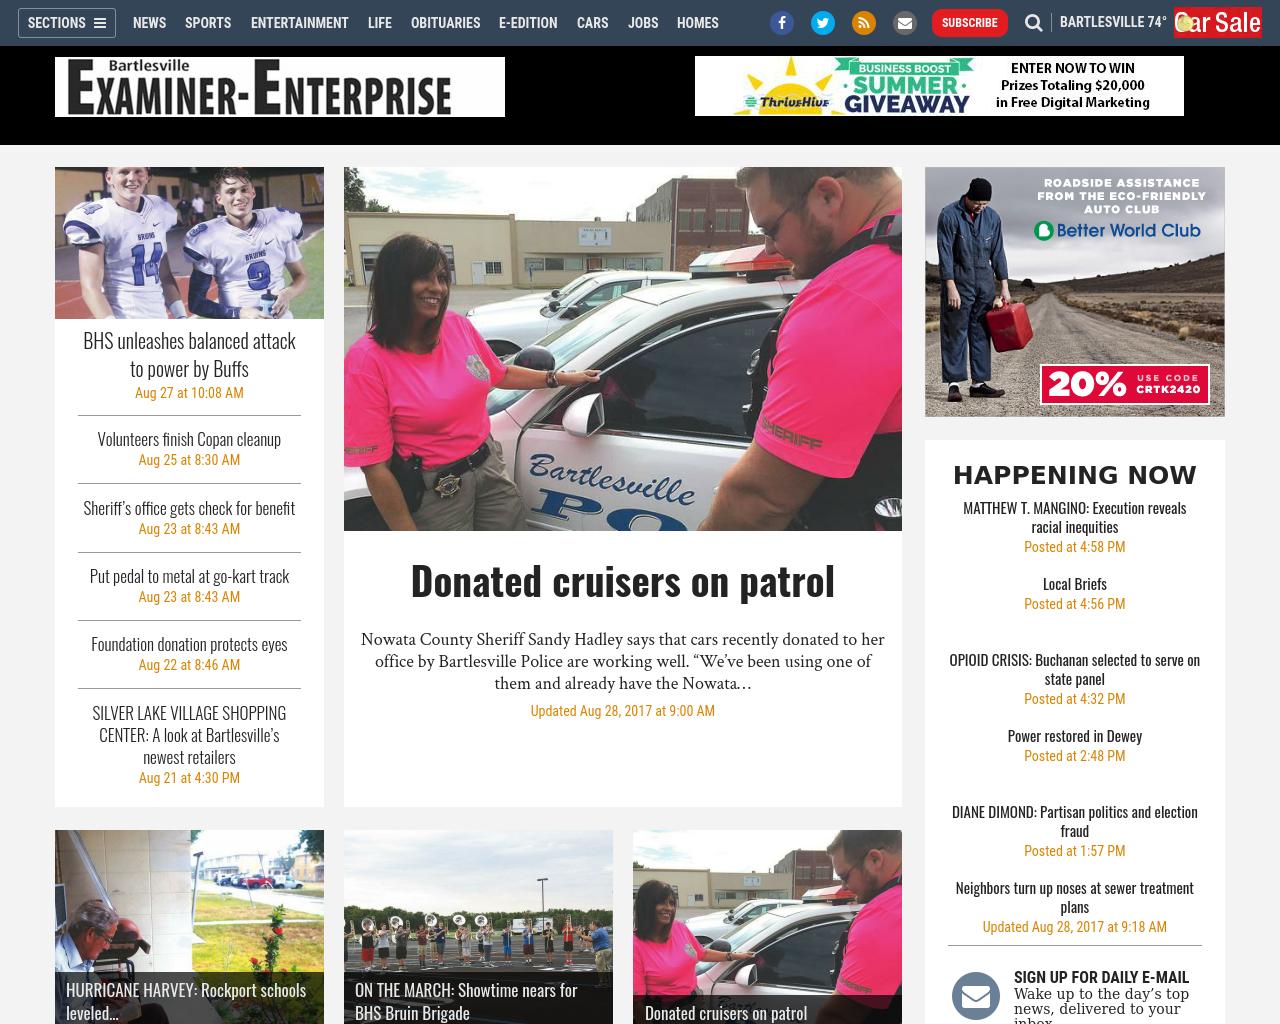 Examiner-Enterprise-Advertising-Reviews-Pricing